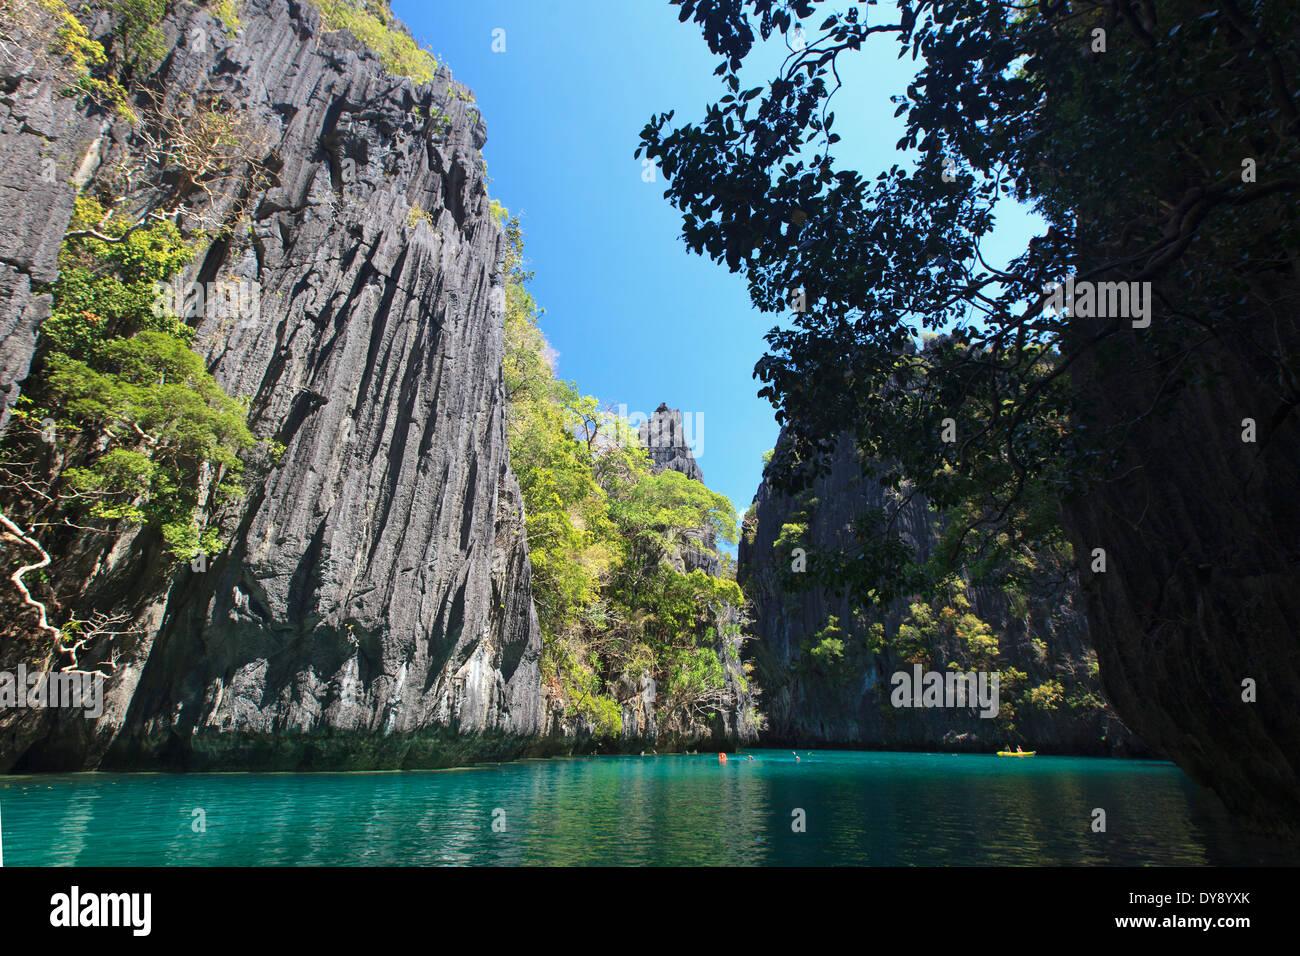 Philippines, Palawan, El Nido, Miniloc Island, Big Lagoon - Stock Image